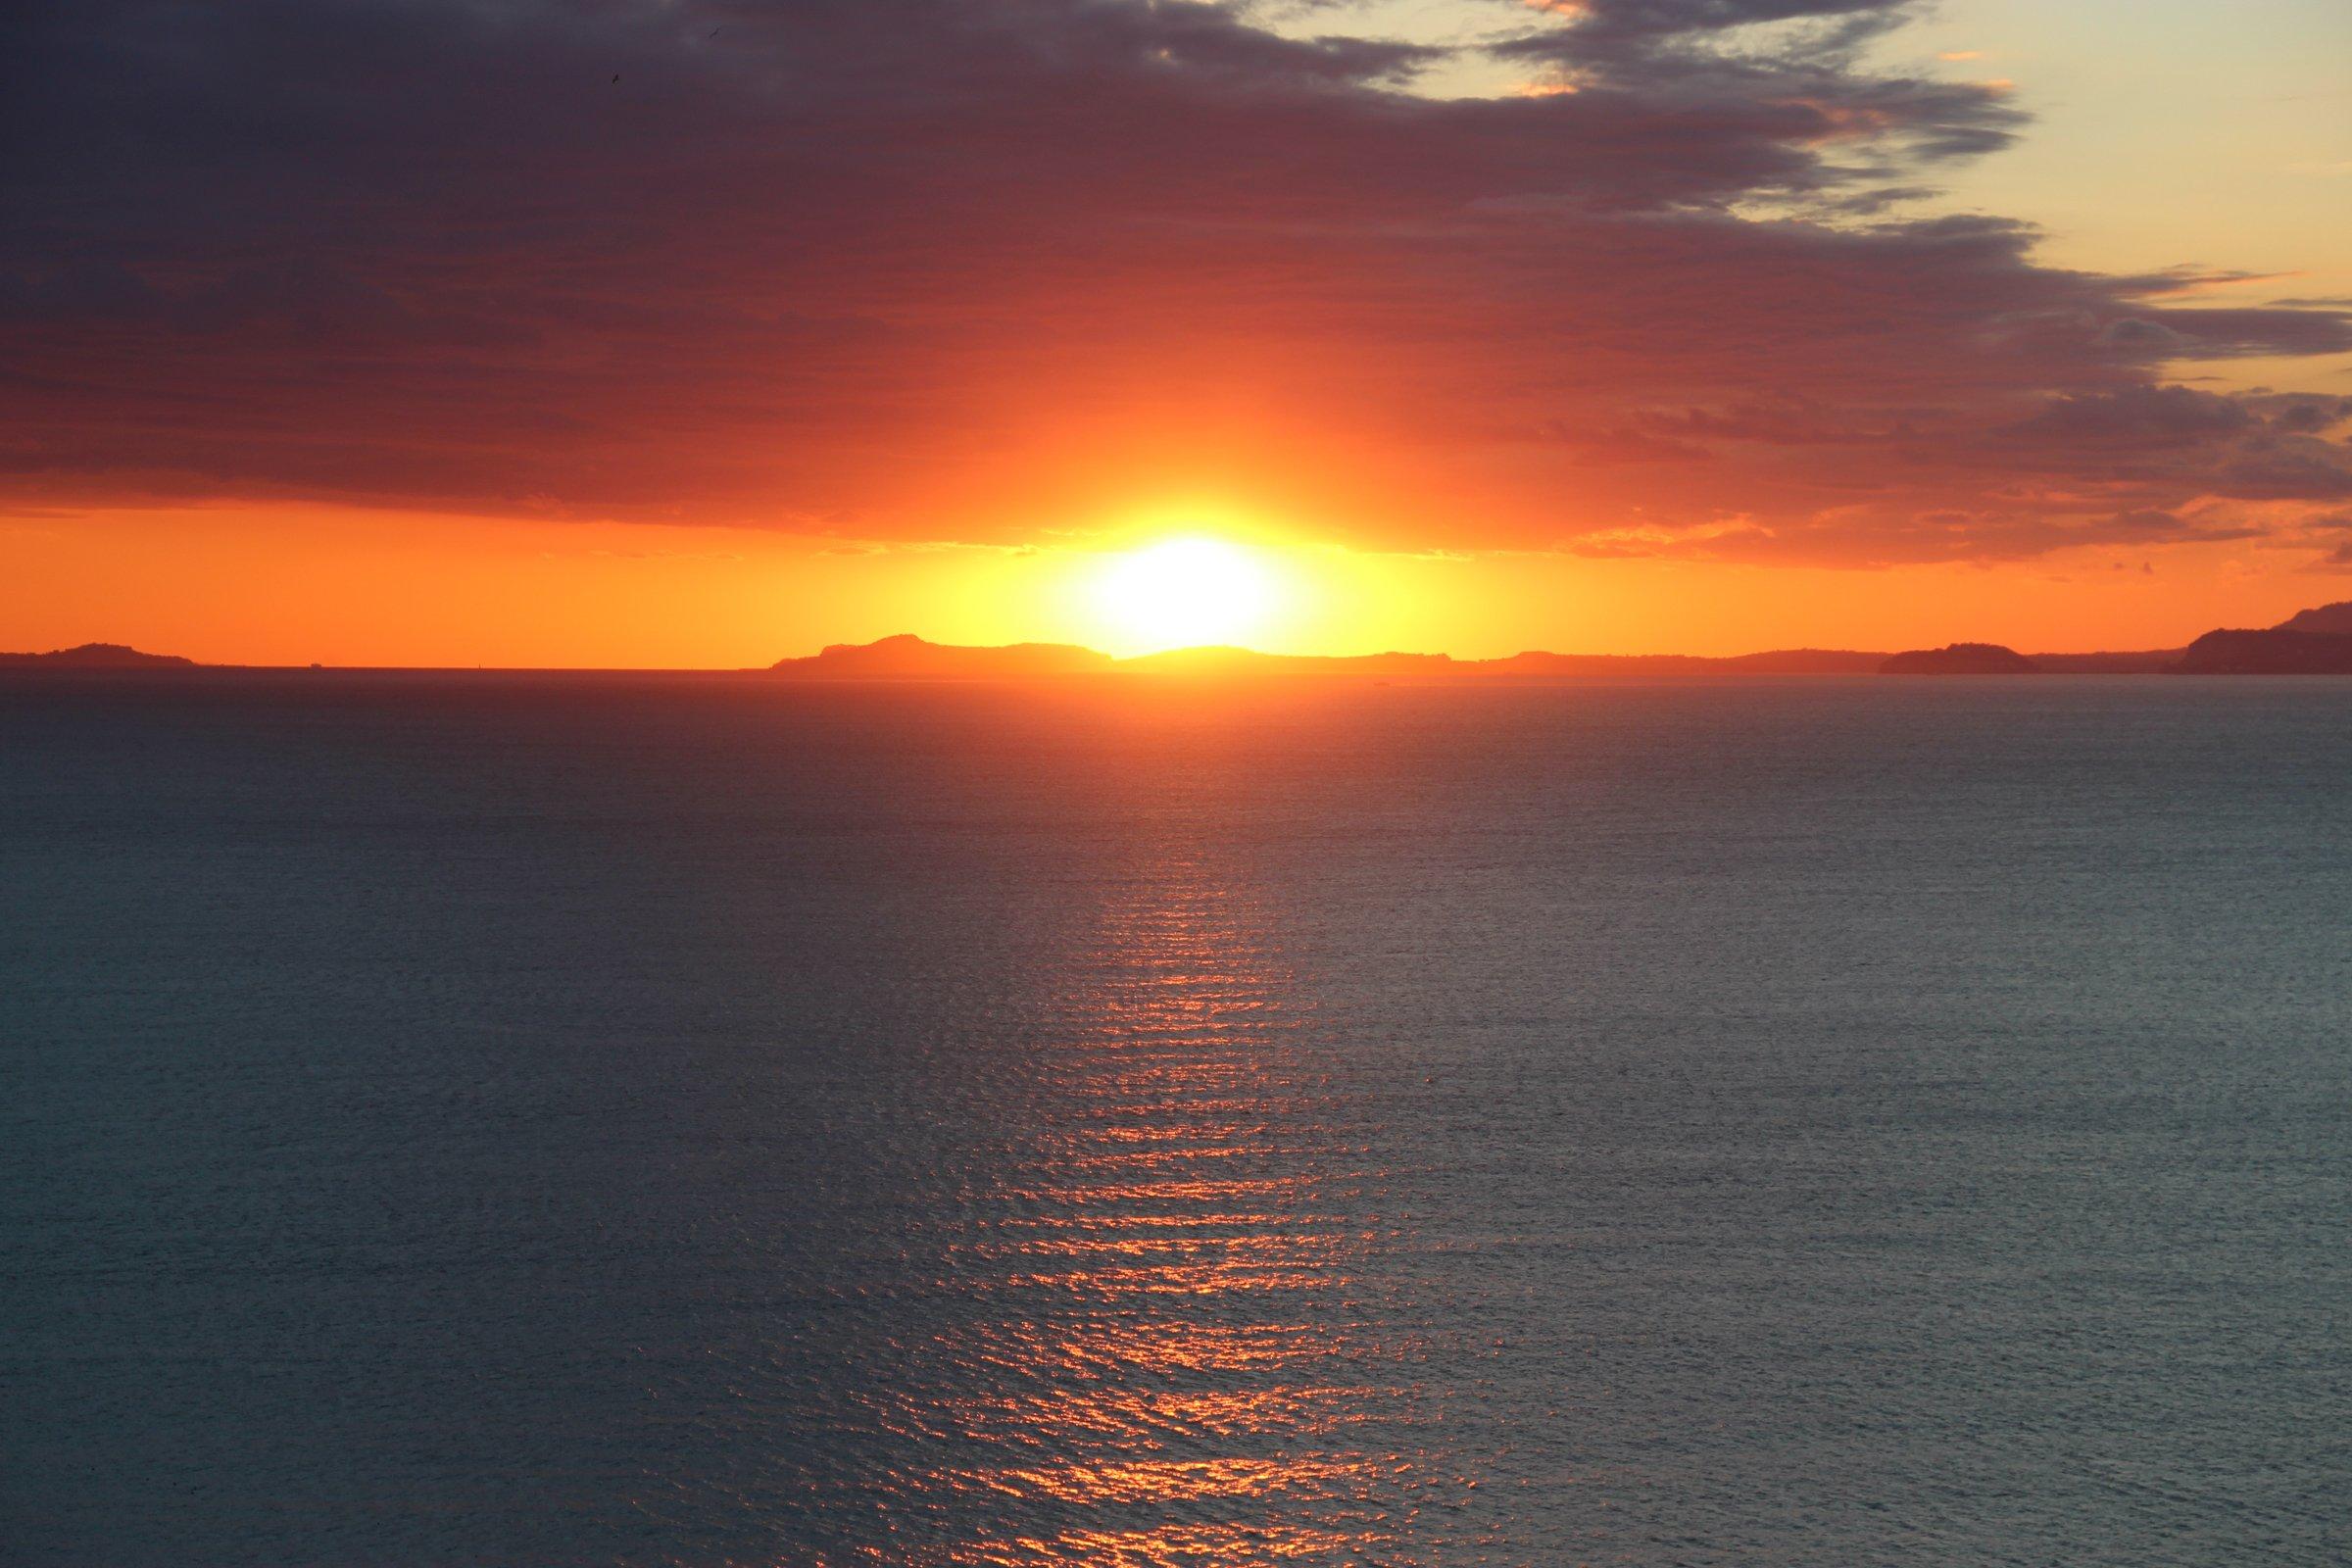 Sunset Behind Island on Ocean